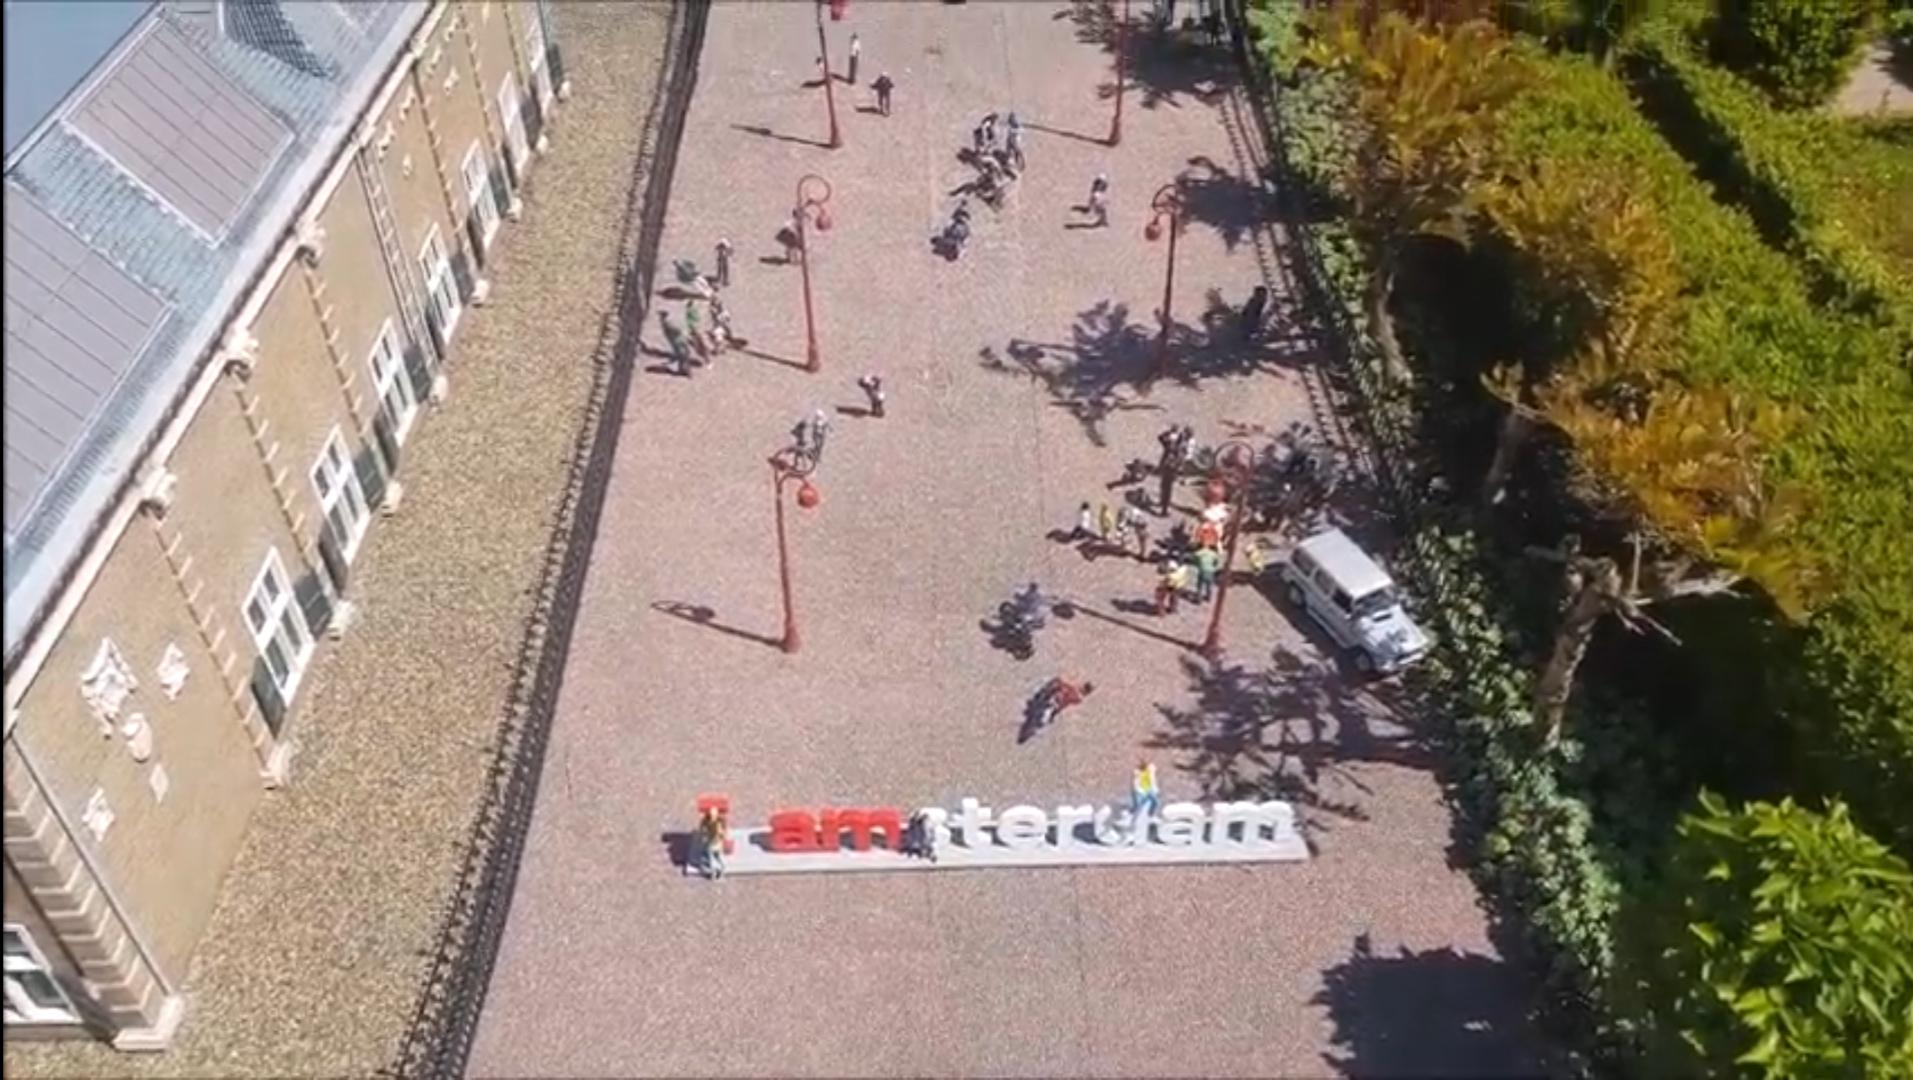 Madurodam: Amsterdam